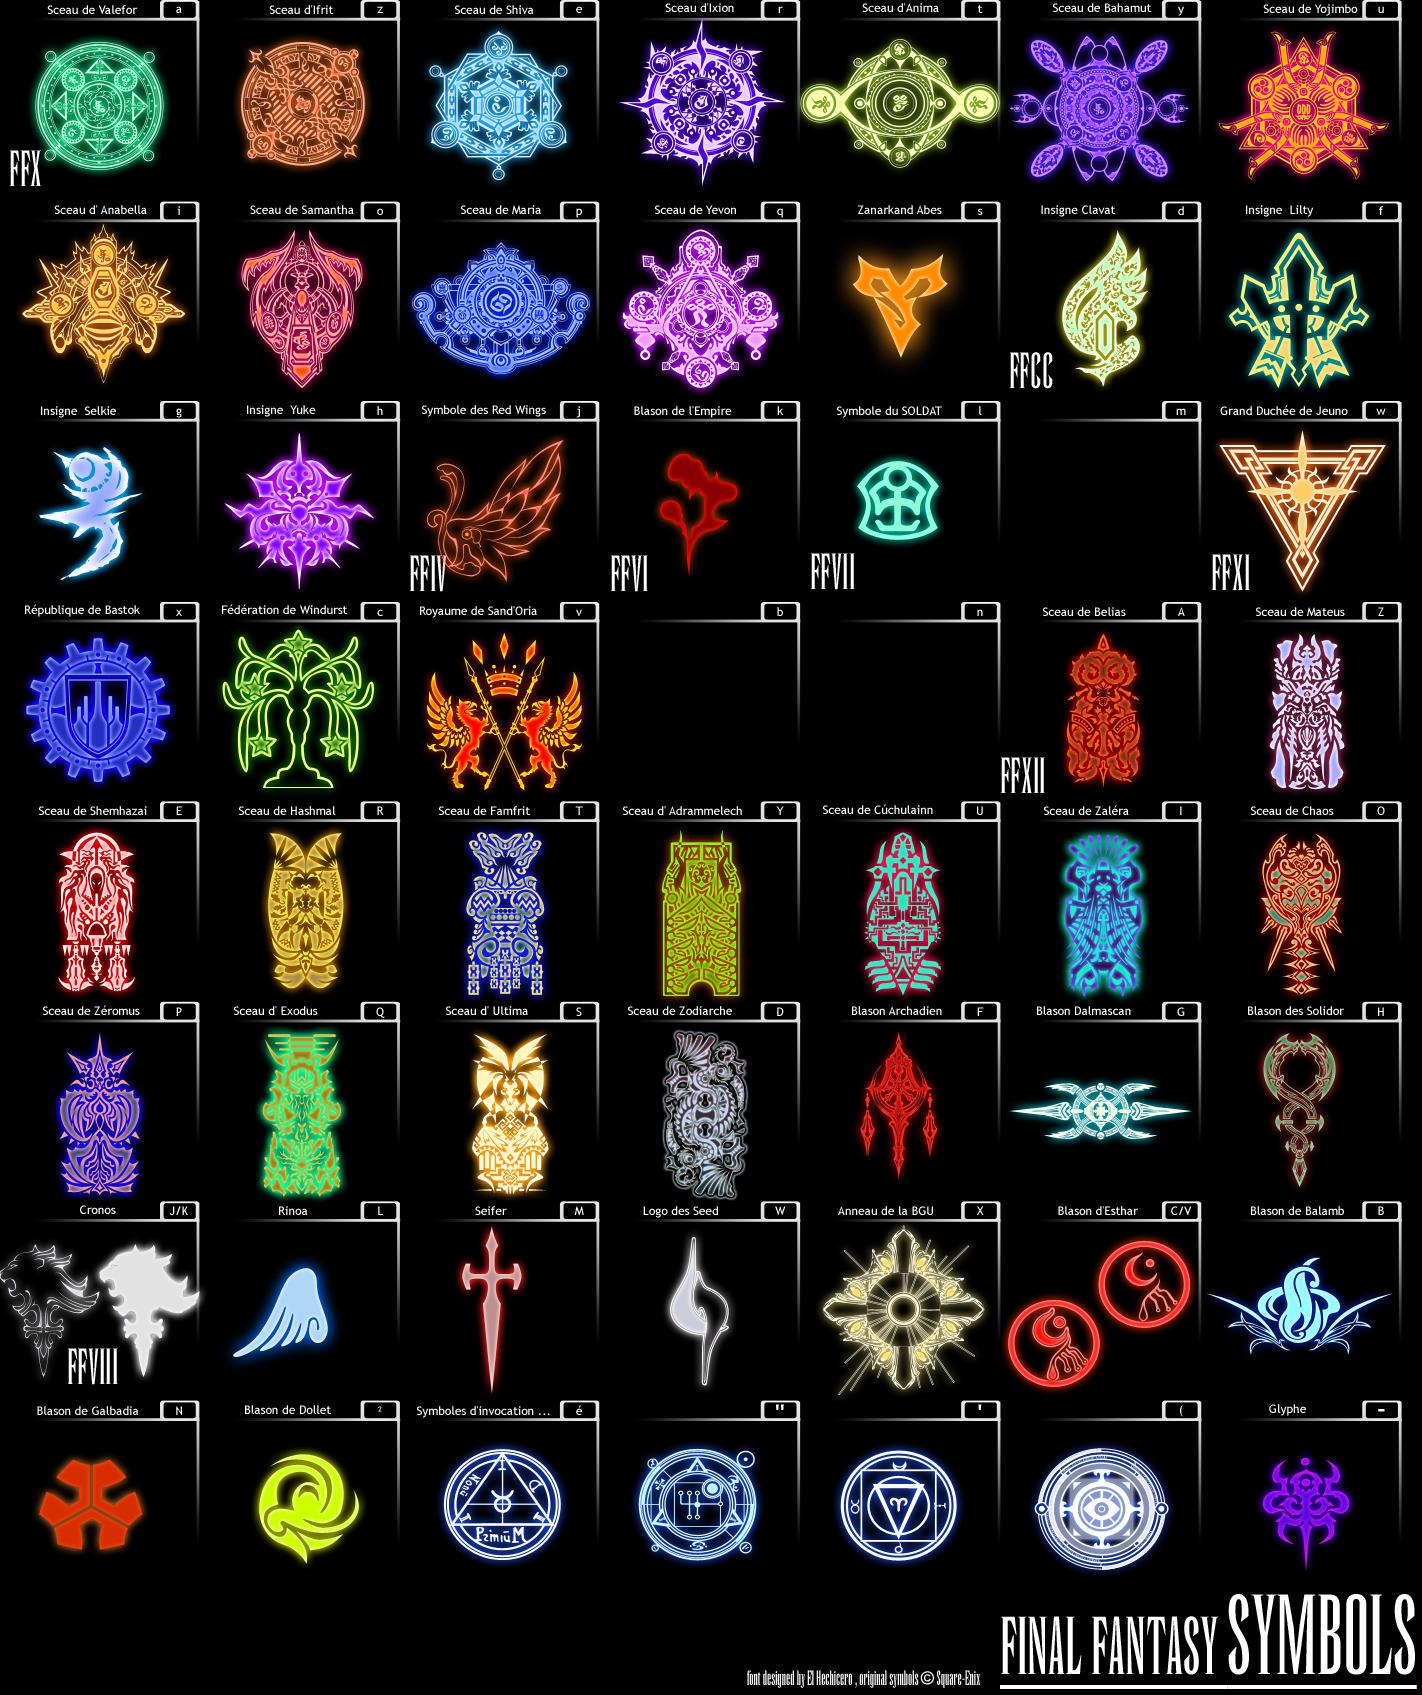 Final Fantasy Symbols By Hechiceroo On Deviantart